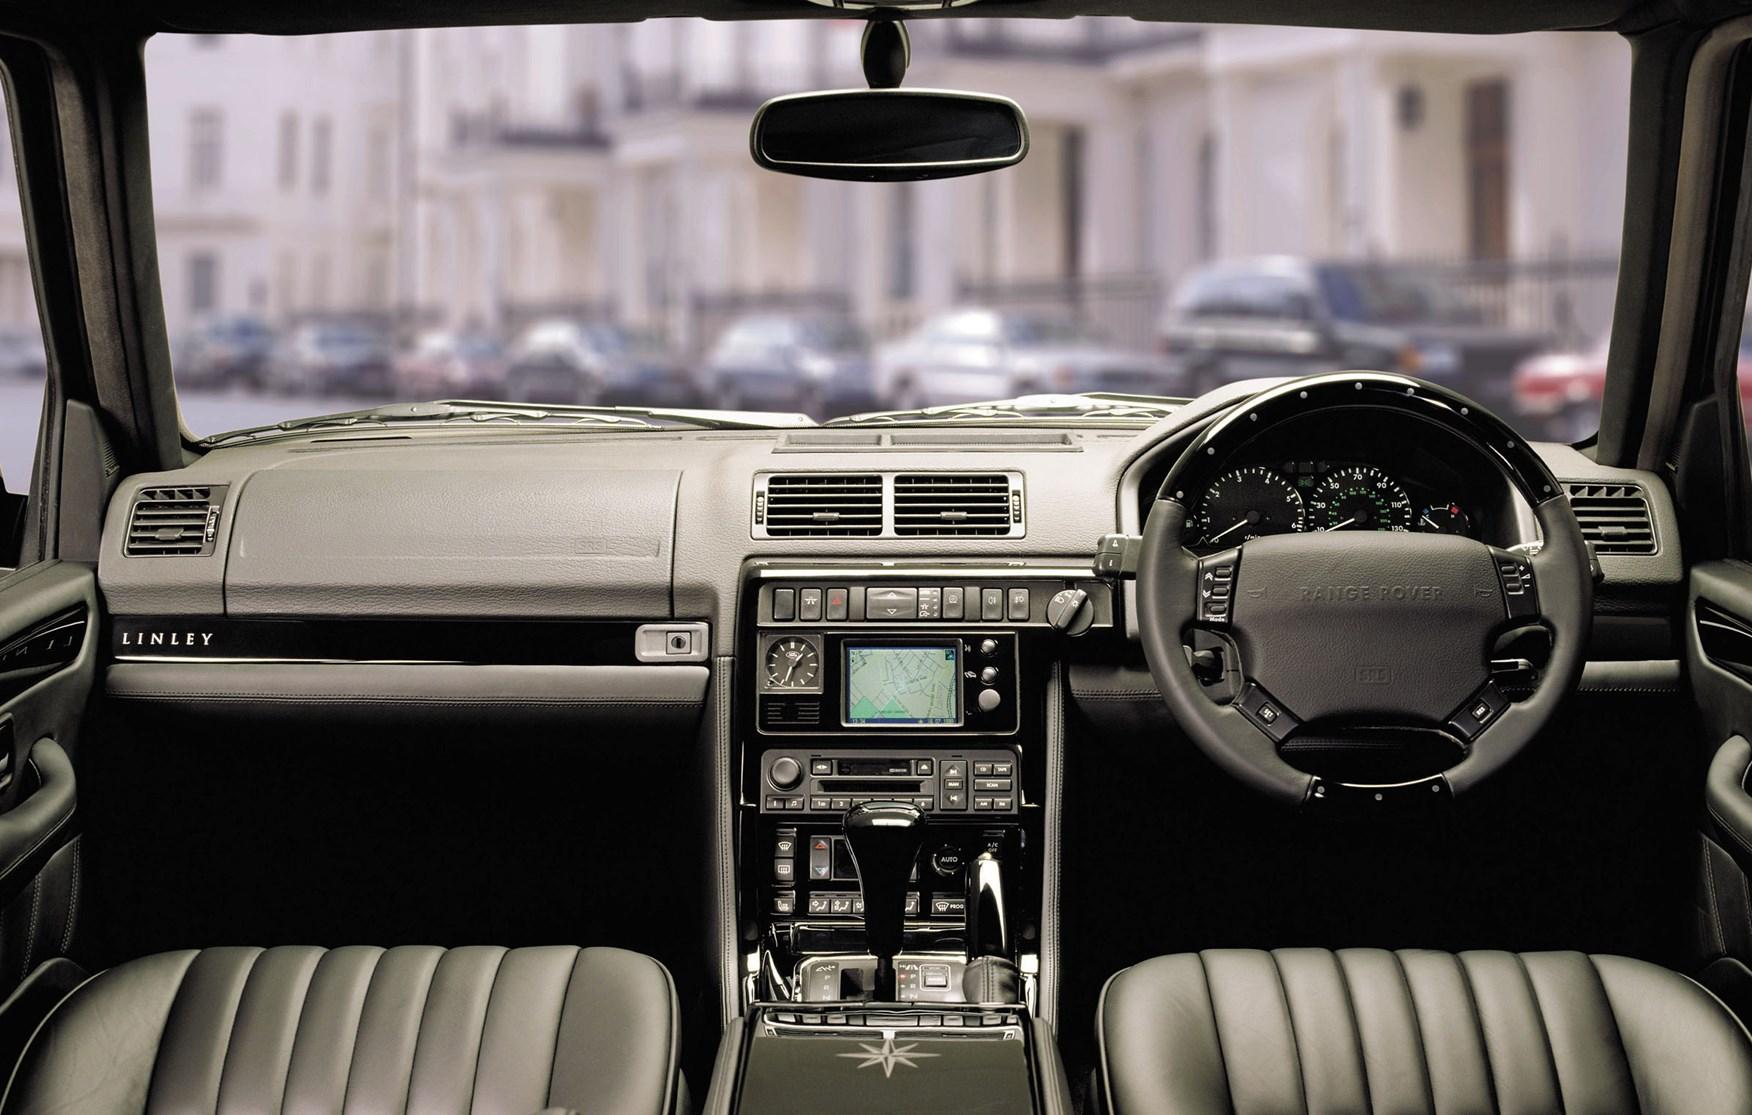 Land Rover Autobiography >> Land Rover Range Rover Station Wagon (1994 - 2002) Photos ...